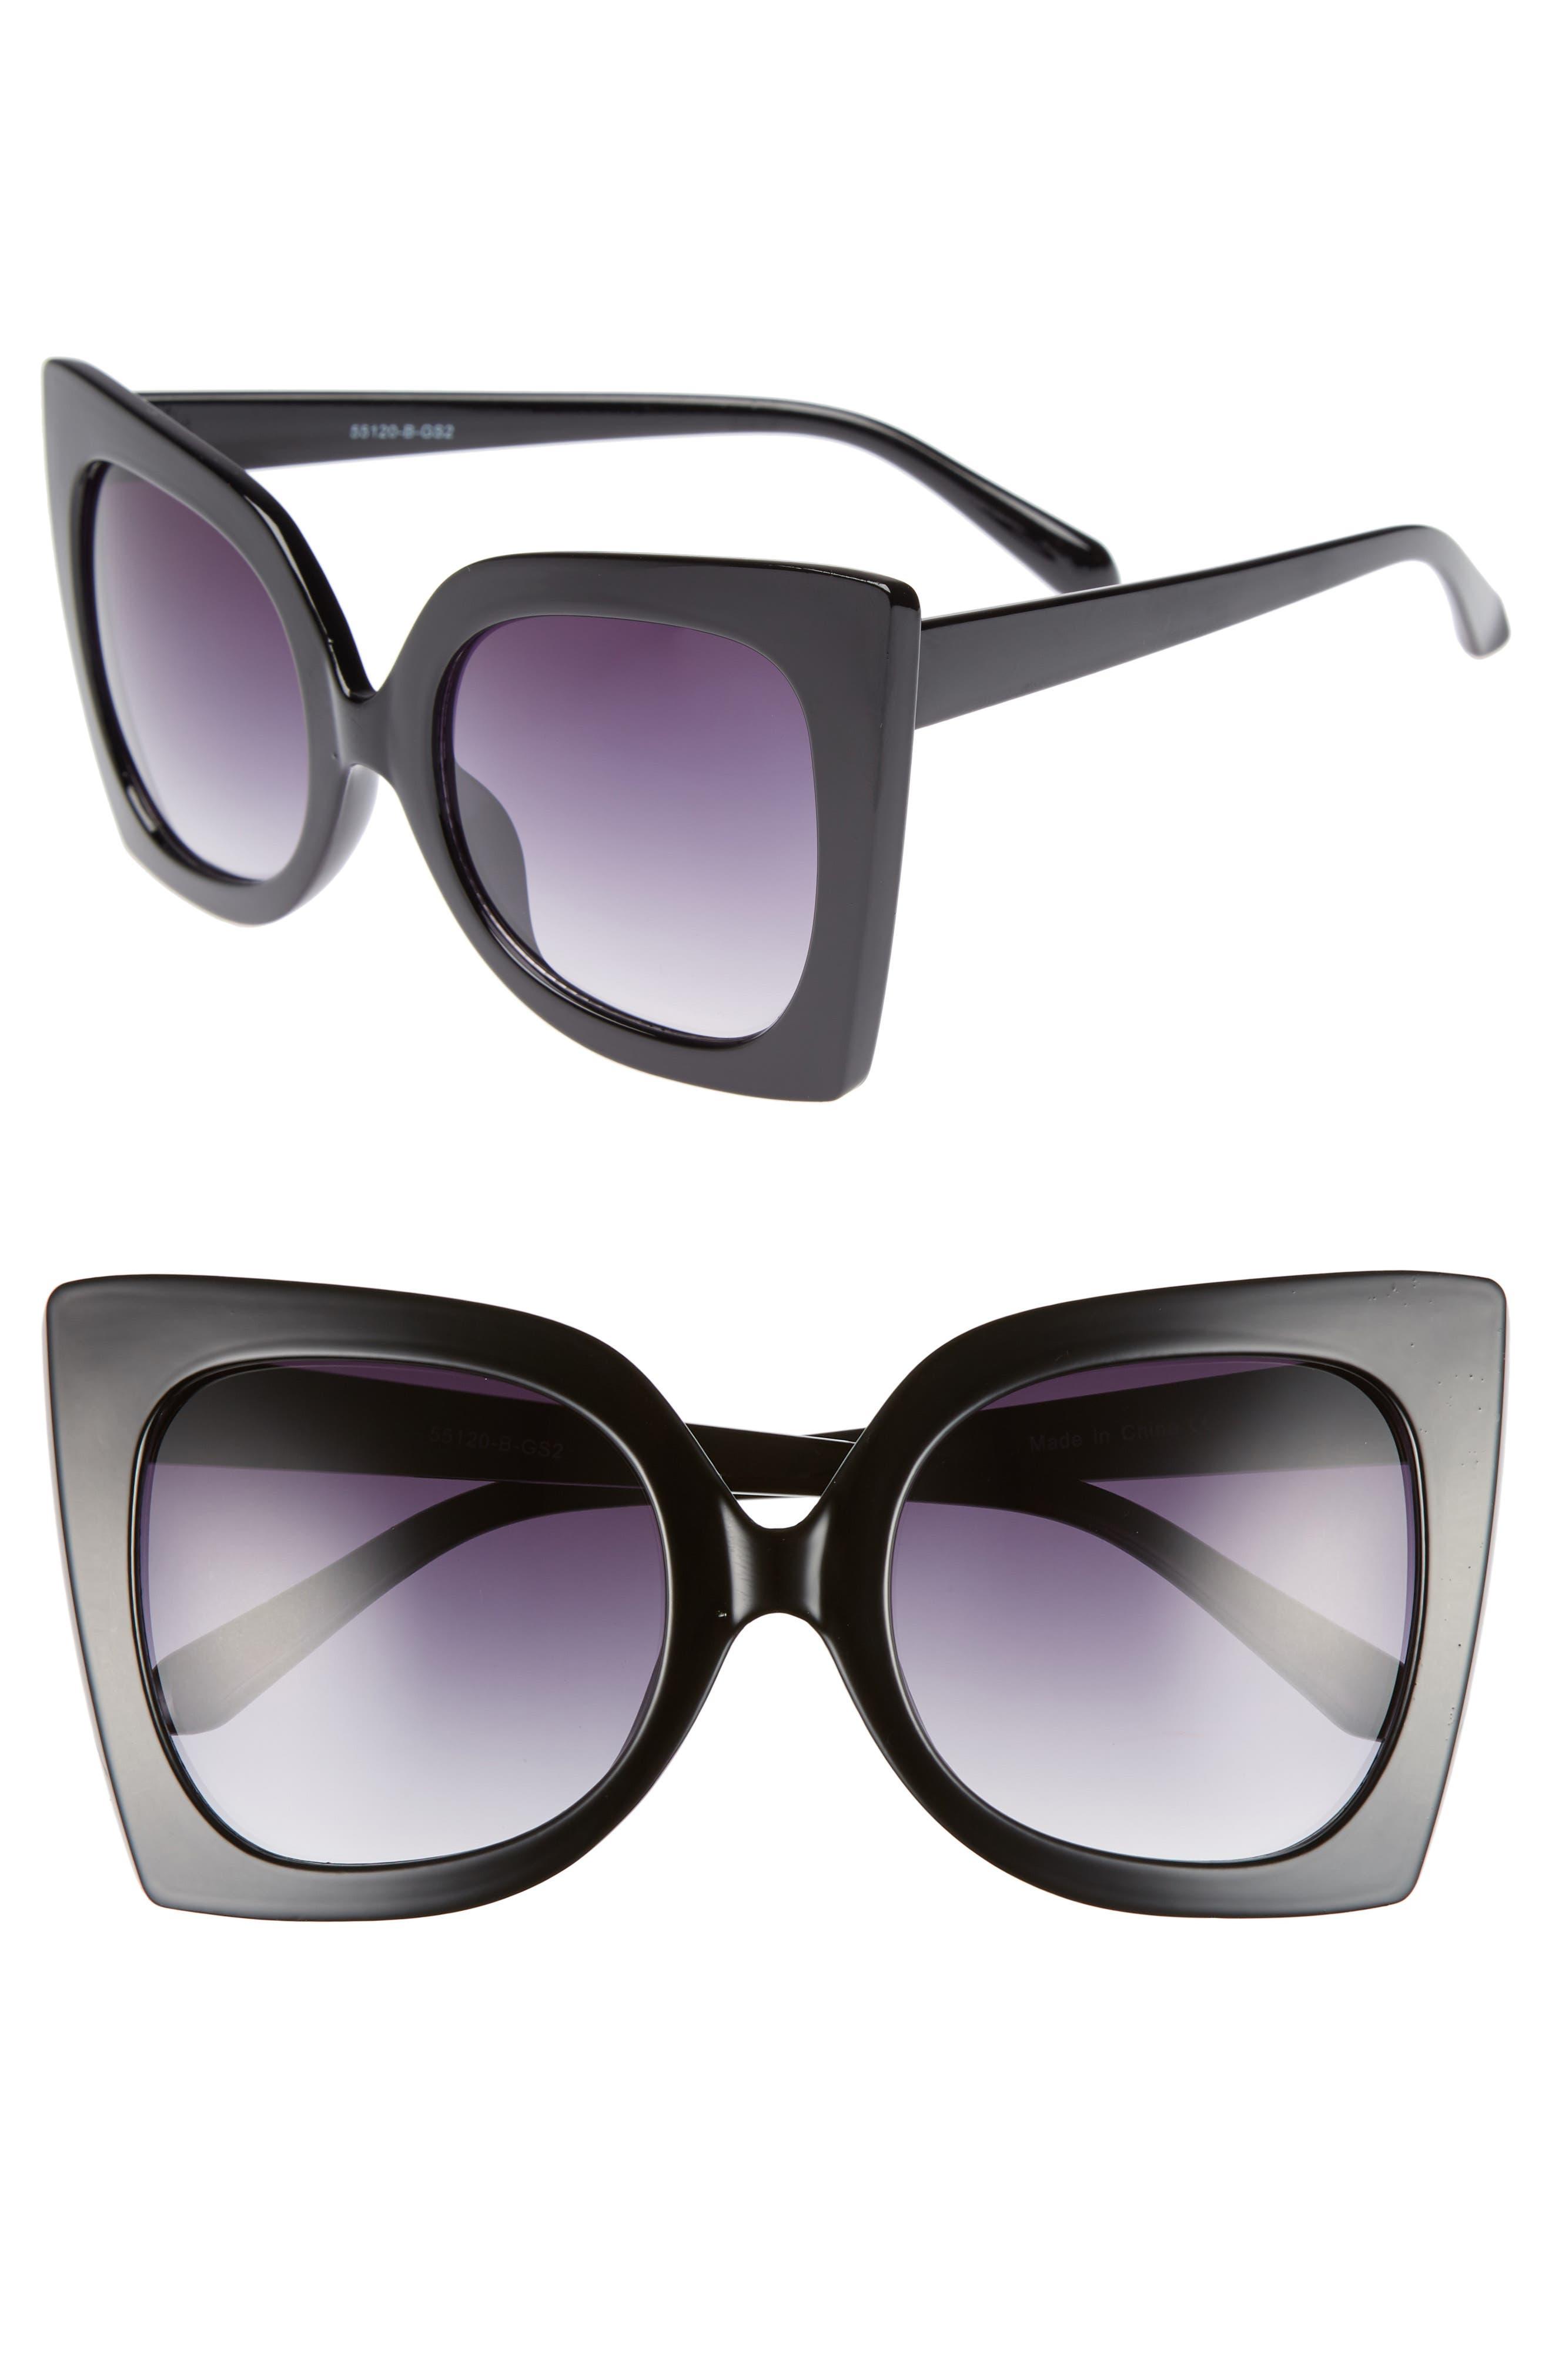 56mm Exaggerated Square Sunglasses,                         Main,                         color, Black